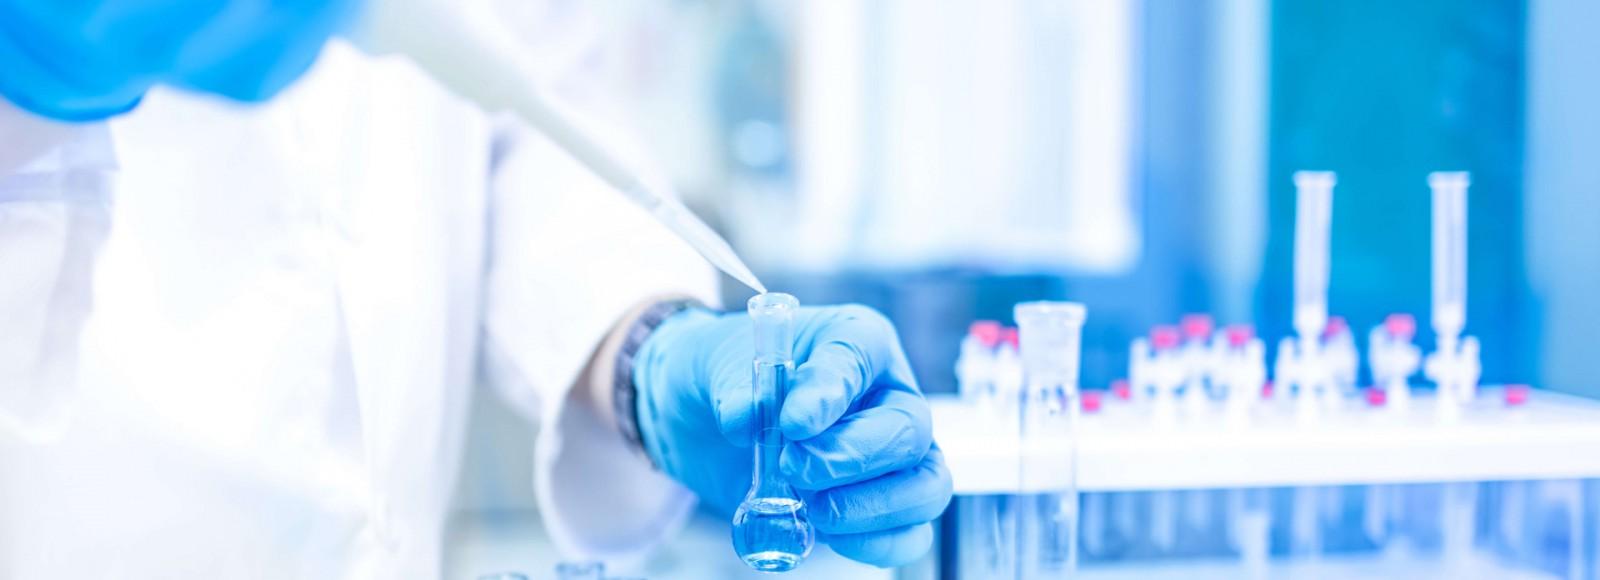 antibody enineering